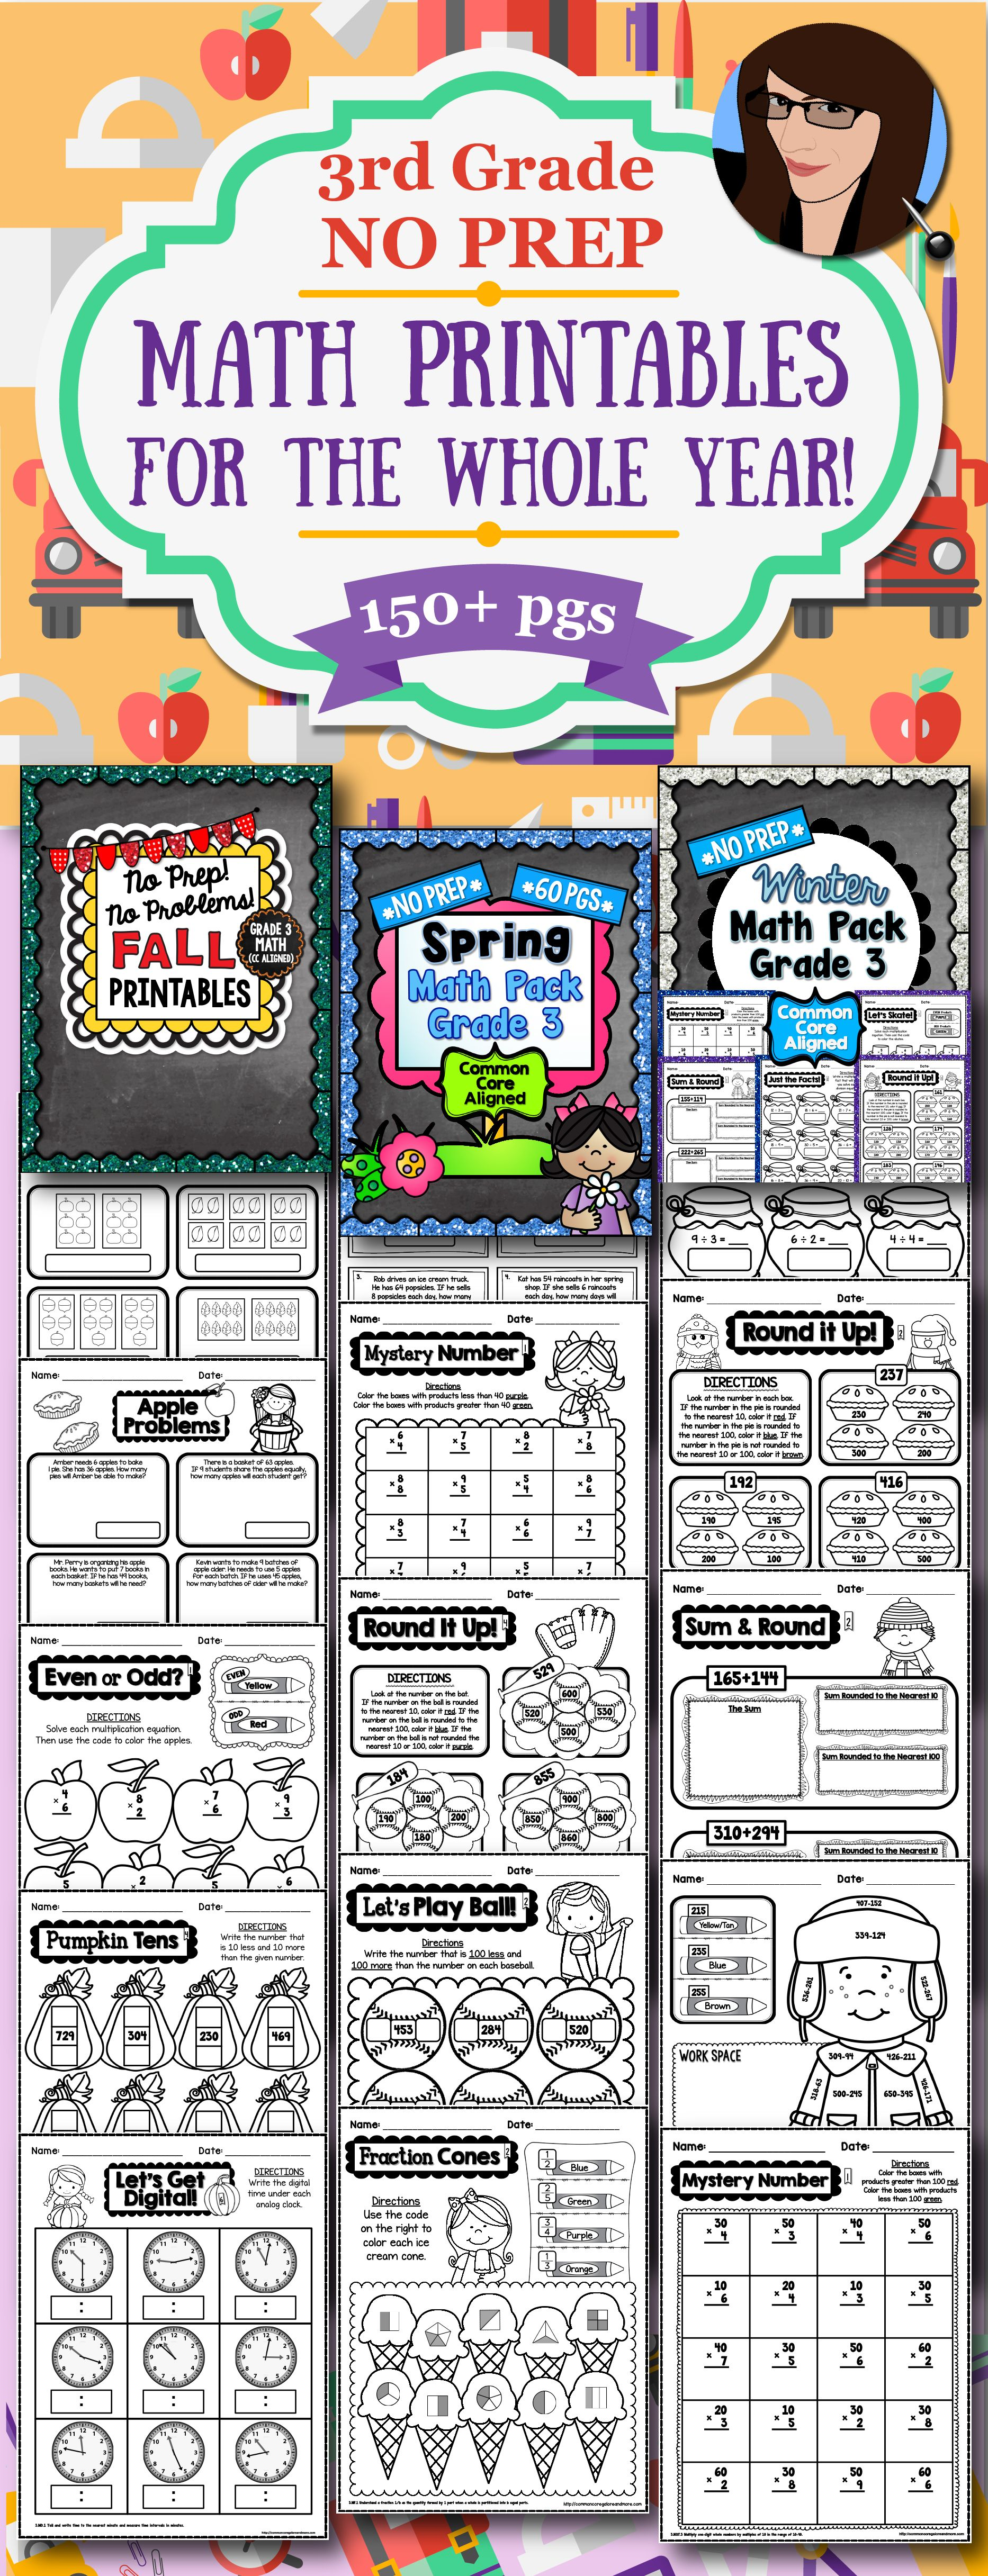 Seasonal No Prep Math Printables For The Whole School Year